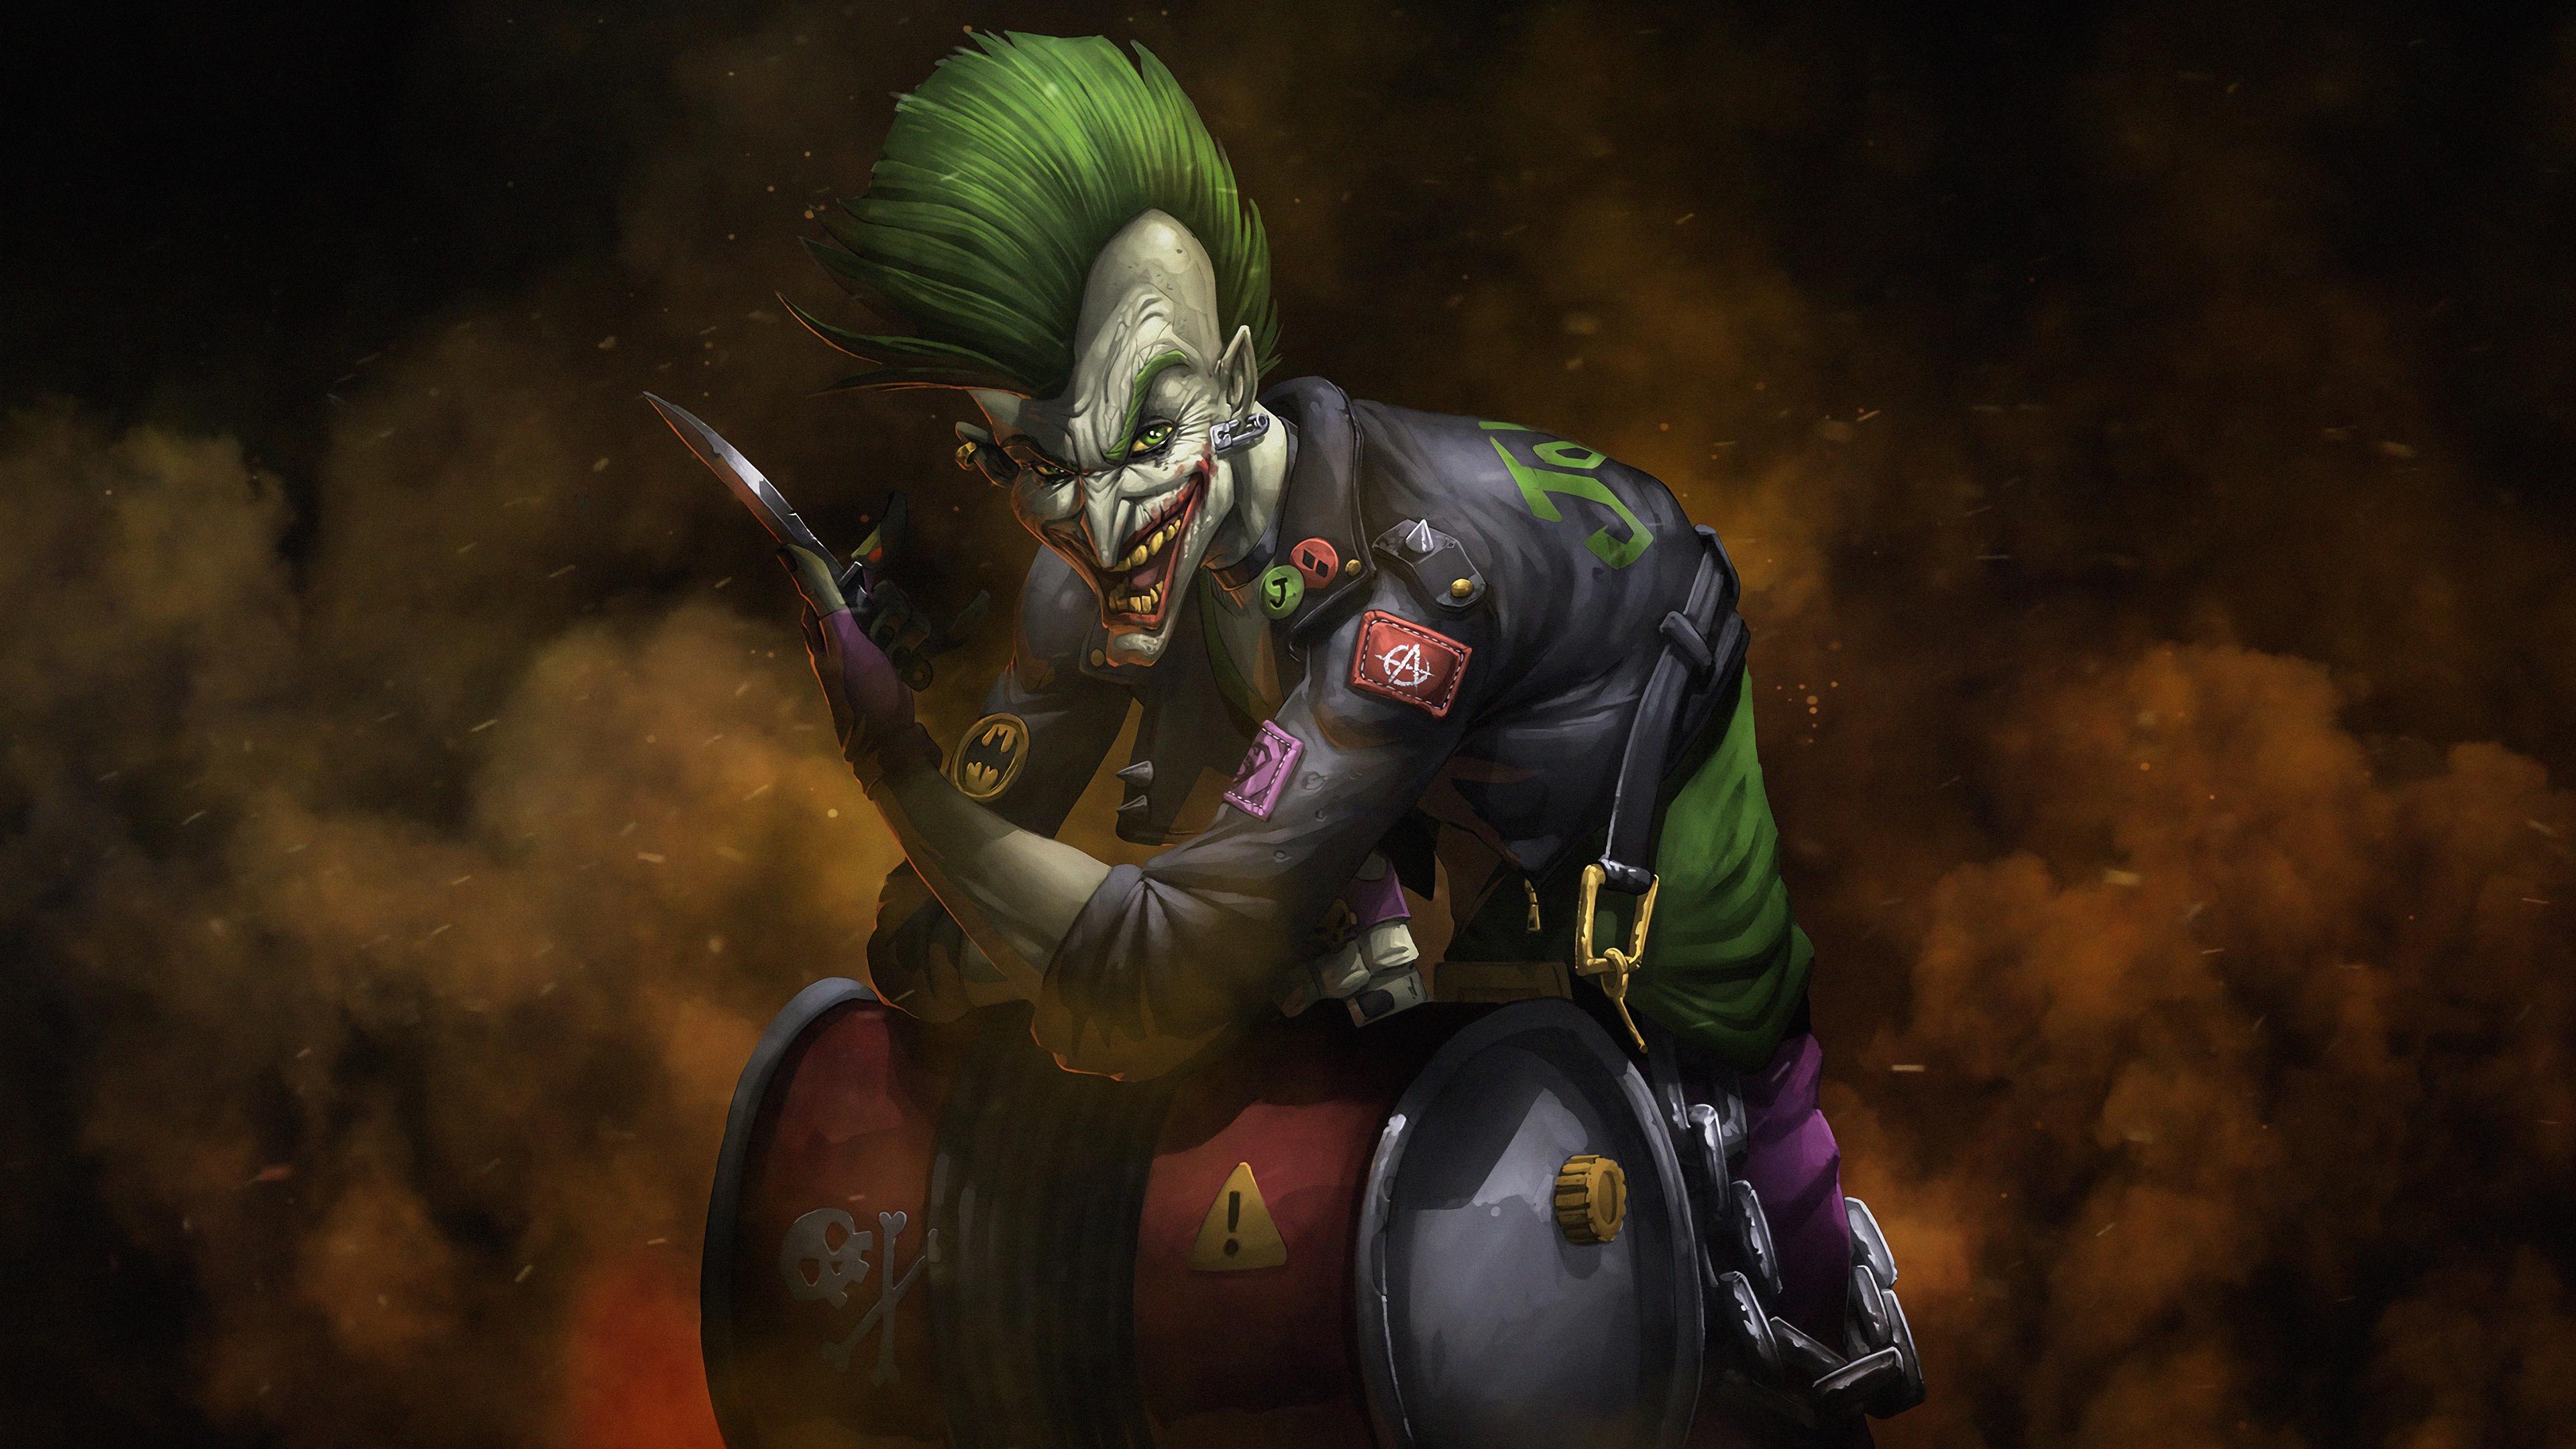 bad joker 1568054729 - Bad Joker - supervillain wallpapers, joker wallpapers, hd-wallpapers, 5k wallpapers, 4k-wallpapers